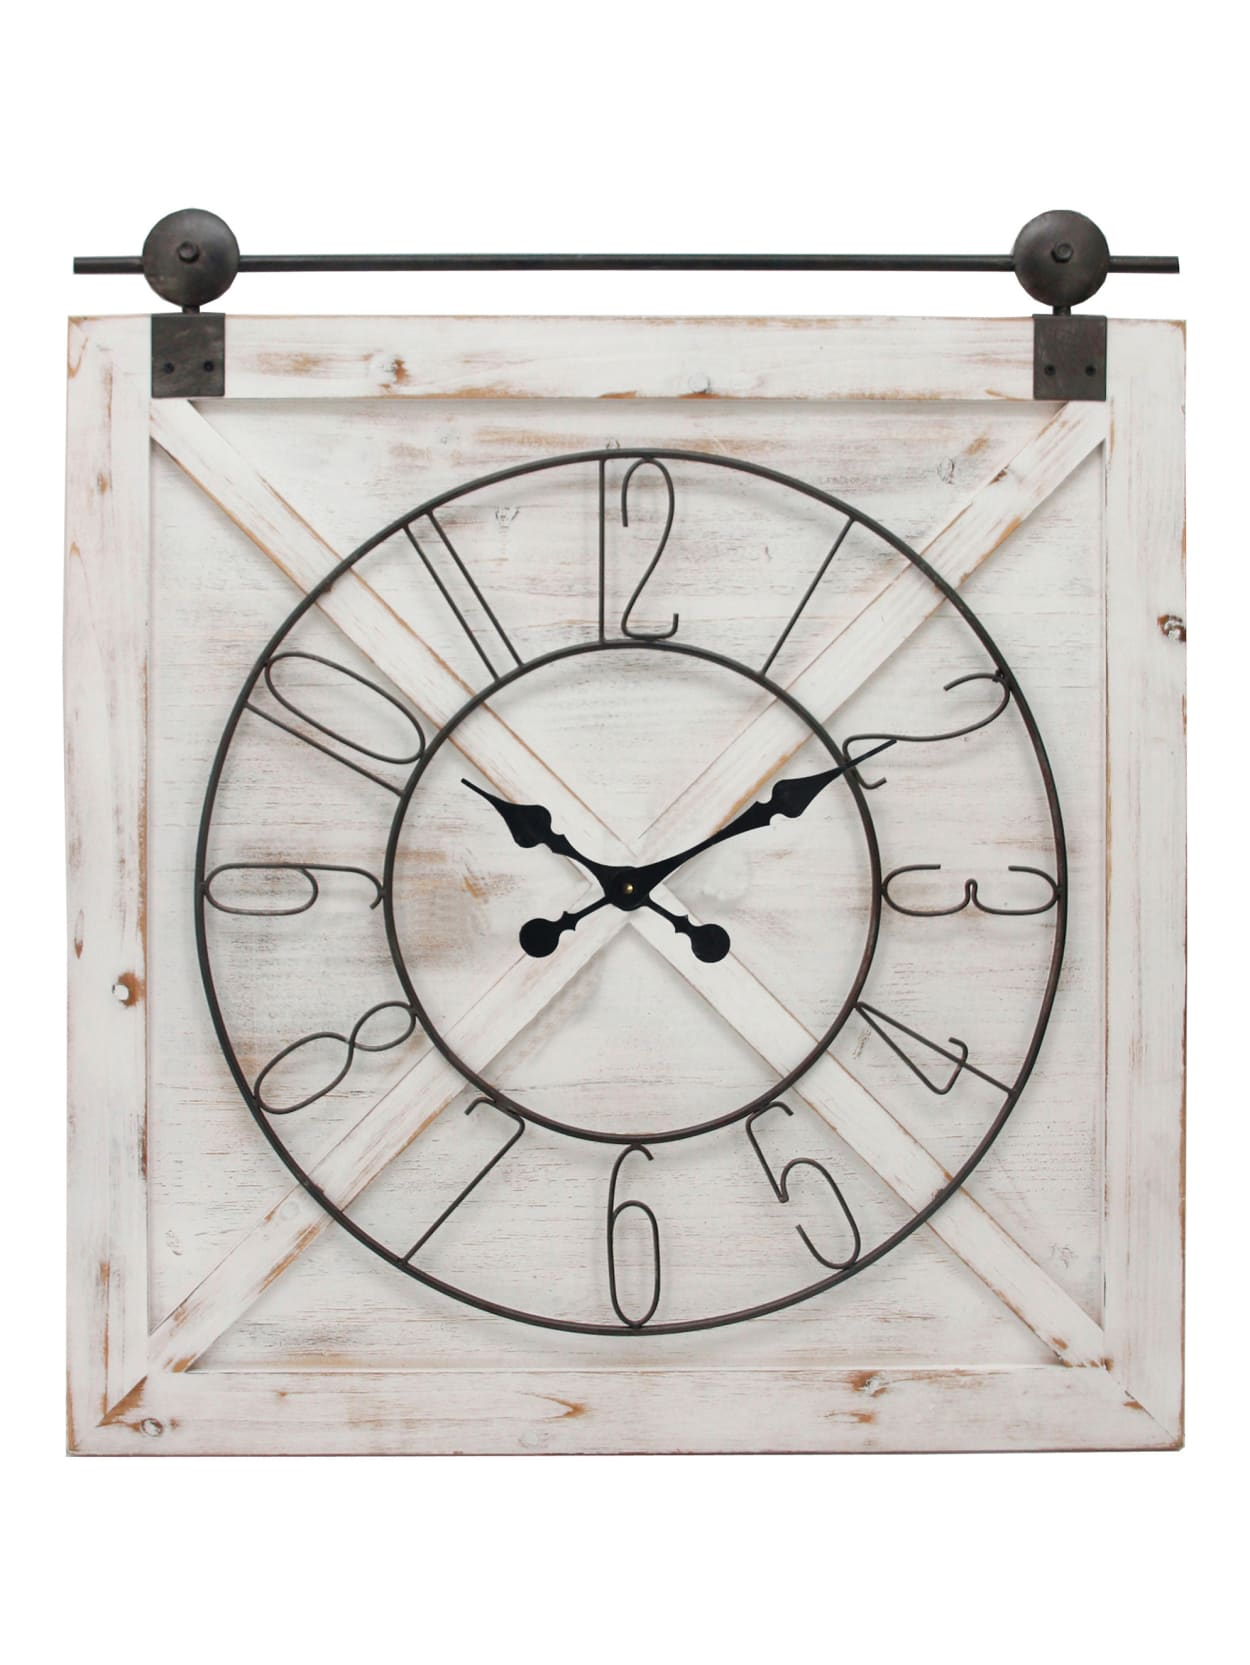 Black Farmstead Barn Door Wall Clock American Designed Black 27 x 2 x 29 inches FirsTime /& Co